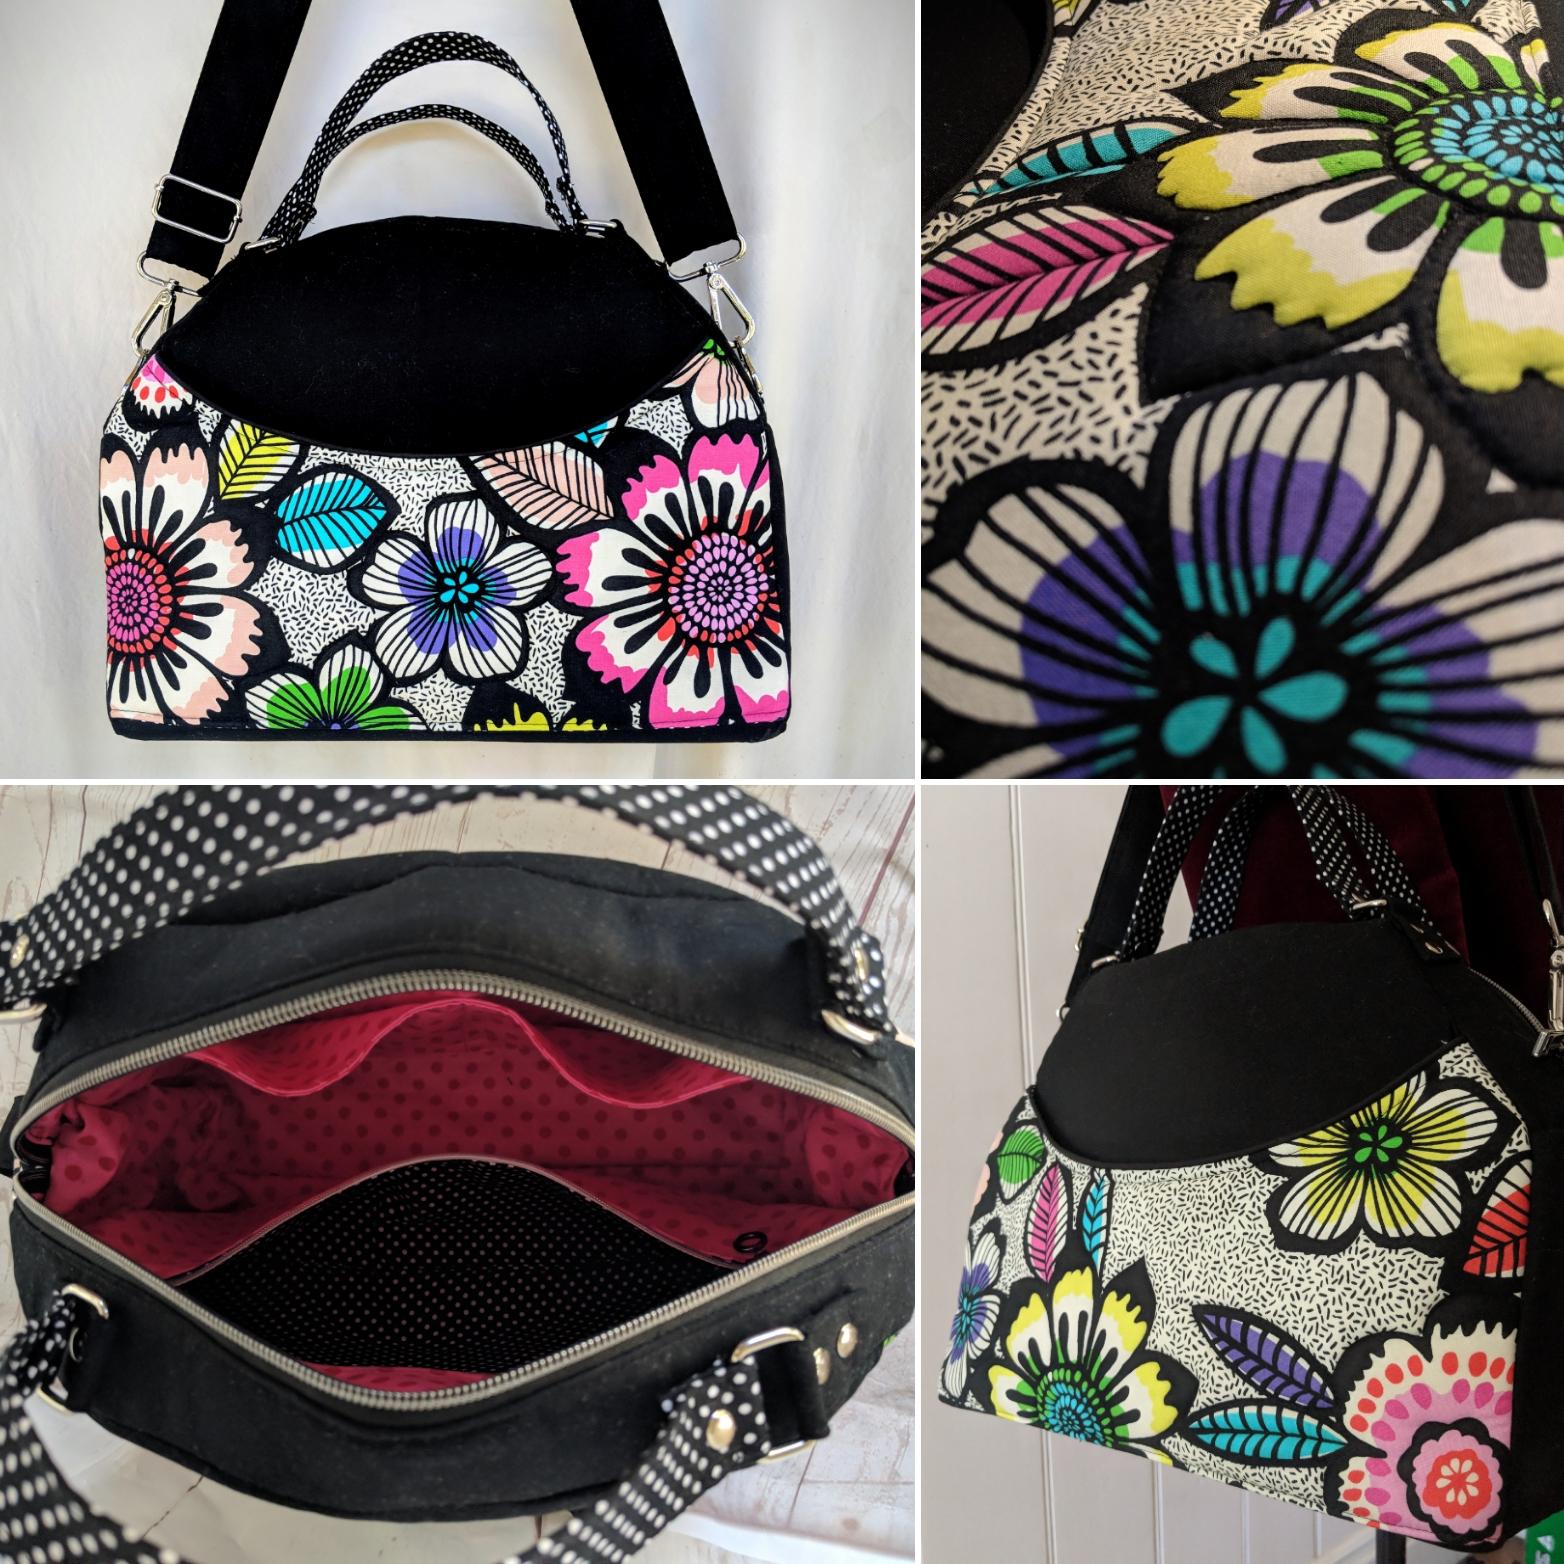 Michelle Walsh's Bowler Bag